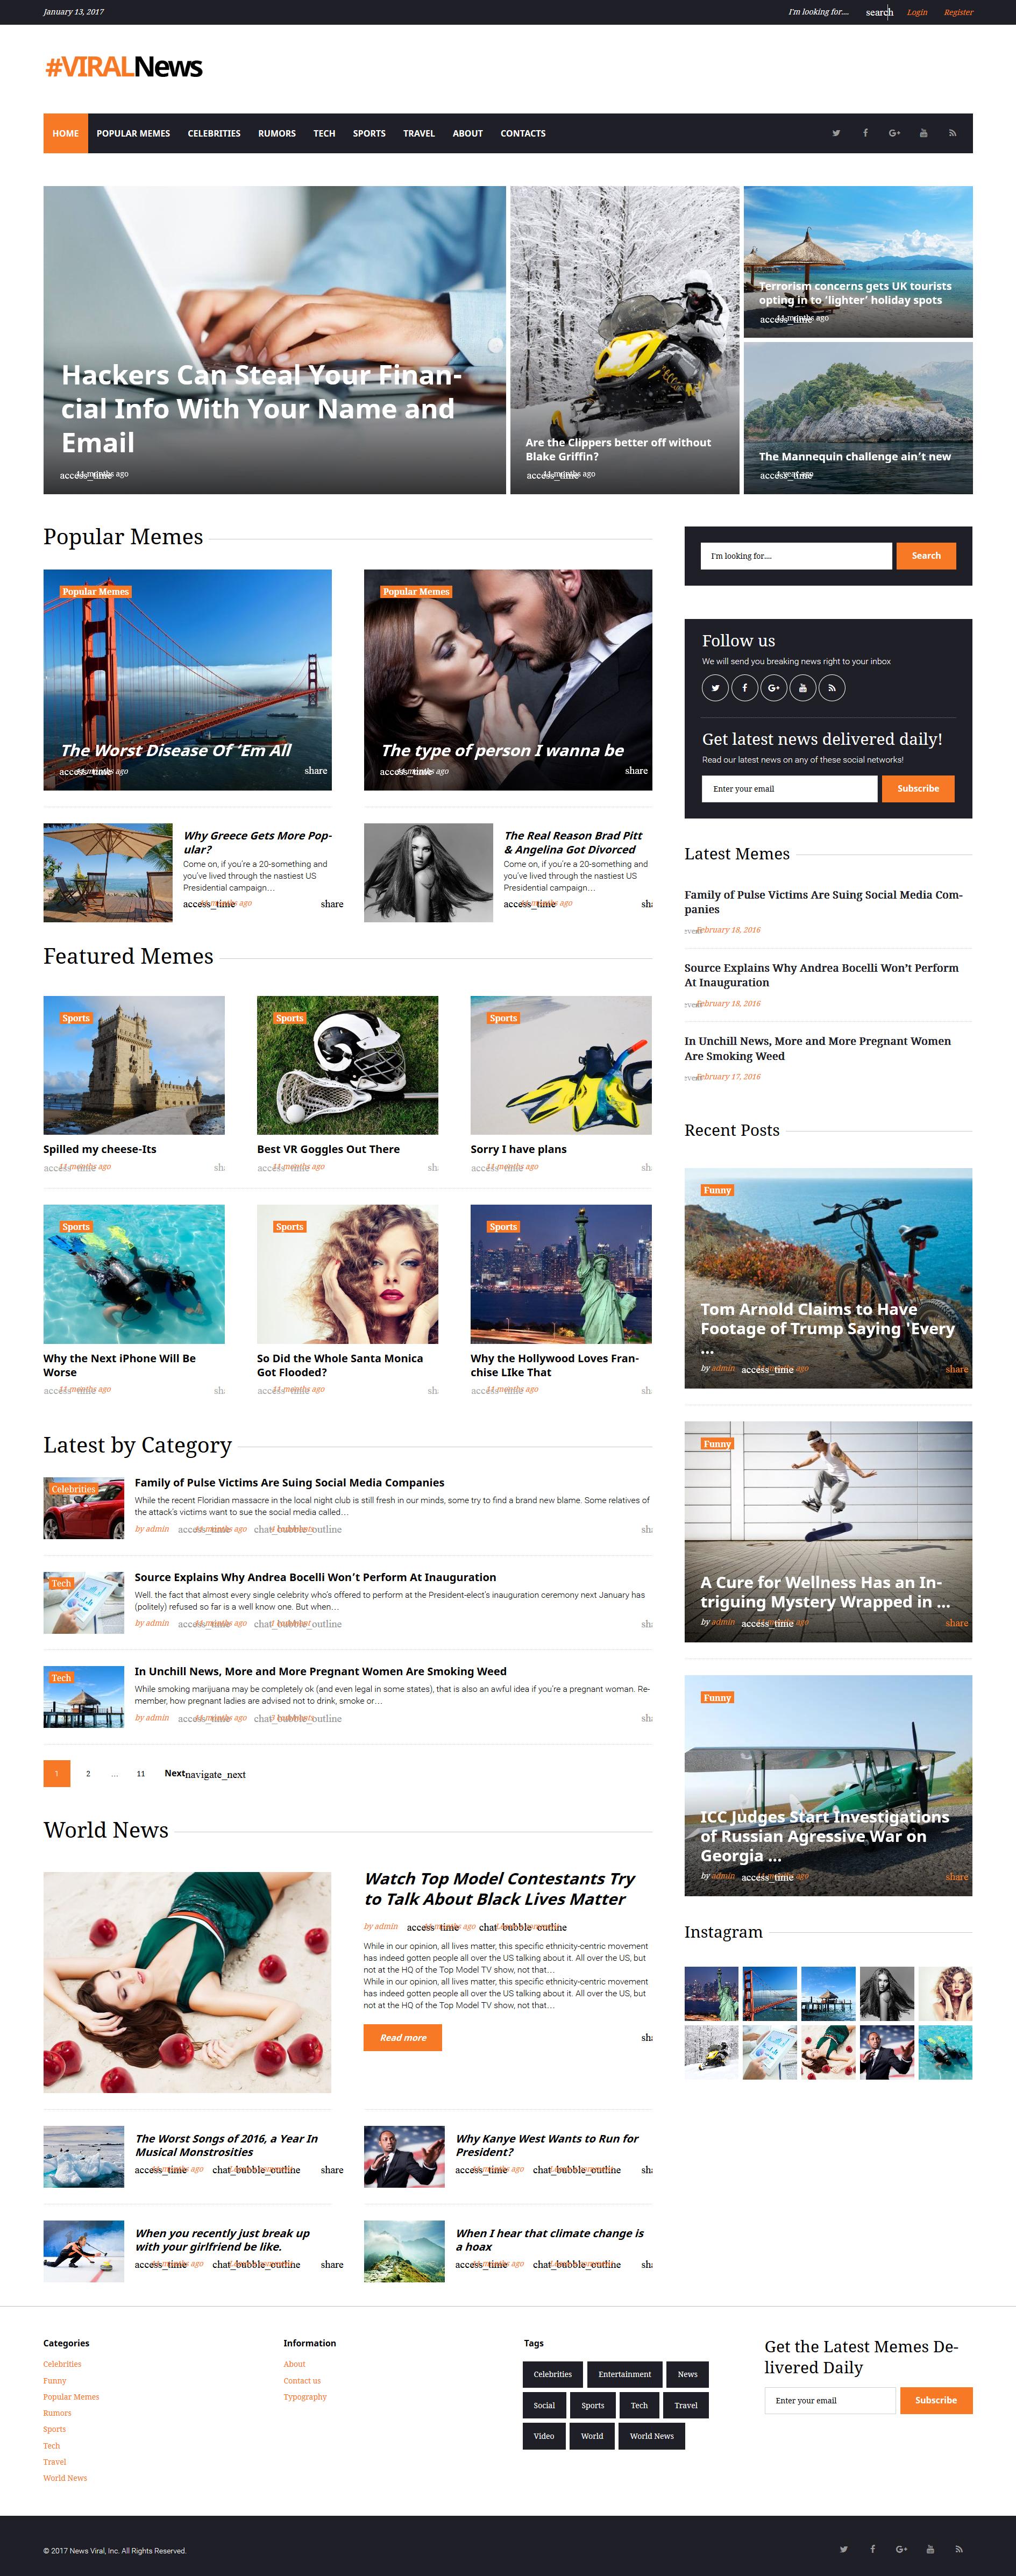 Viral News Portal & Magazine WordPress Theme - screenshot